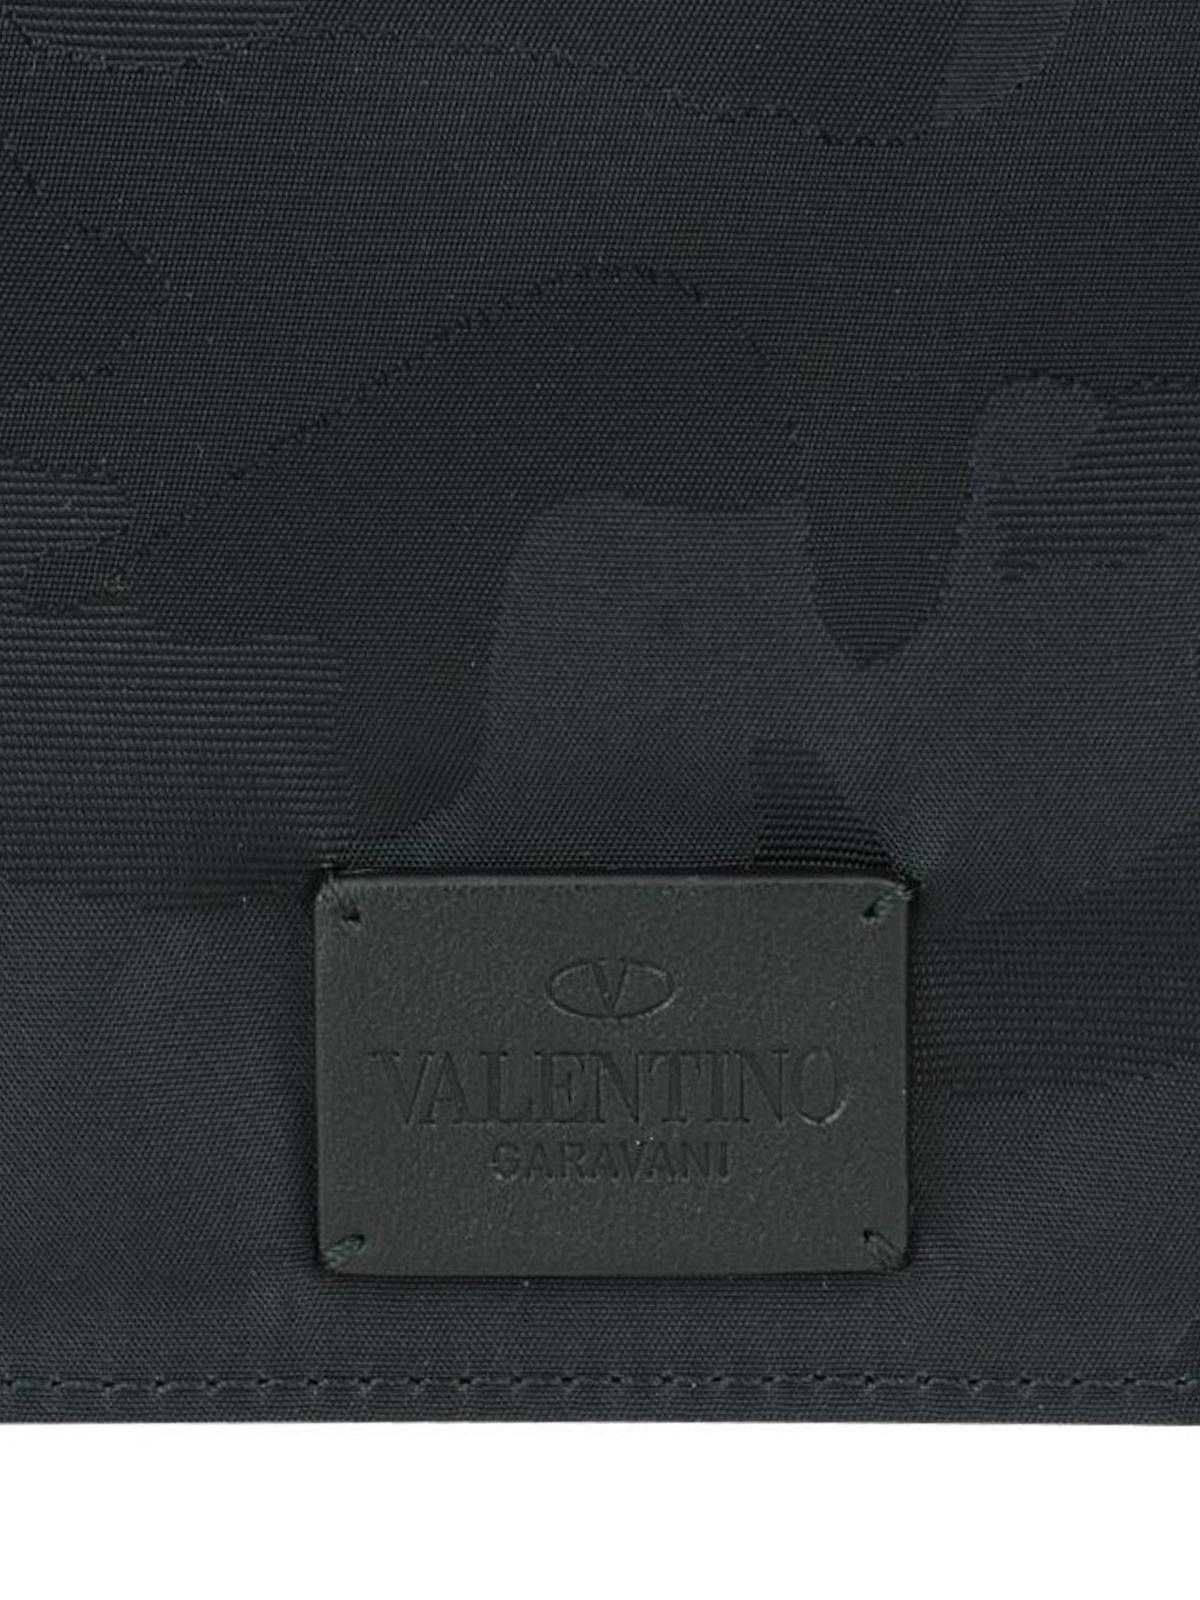 Valentino Camu technical fabric clutch tNc0zJIxSJ